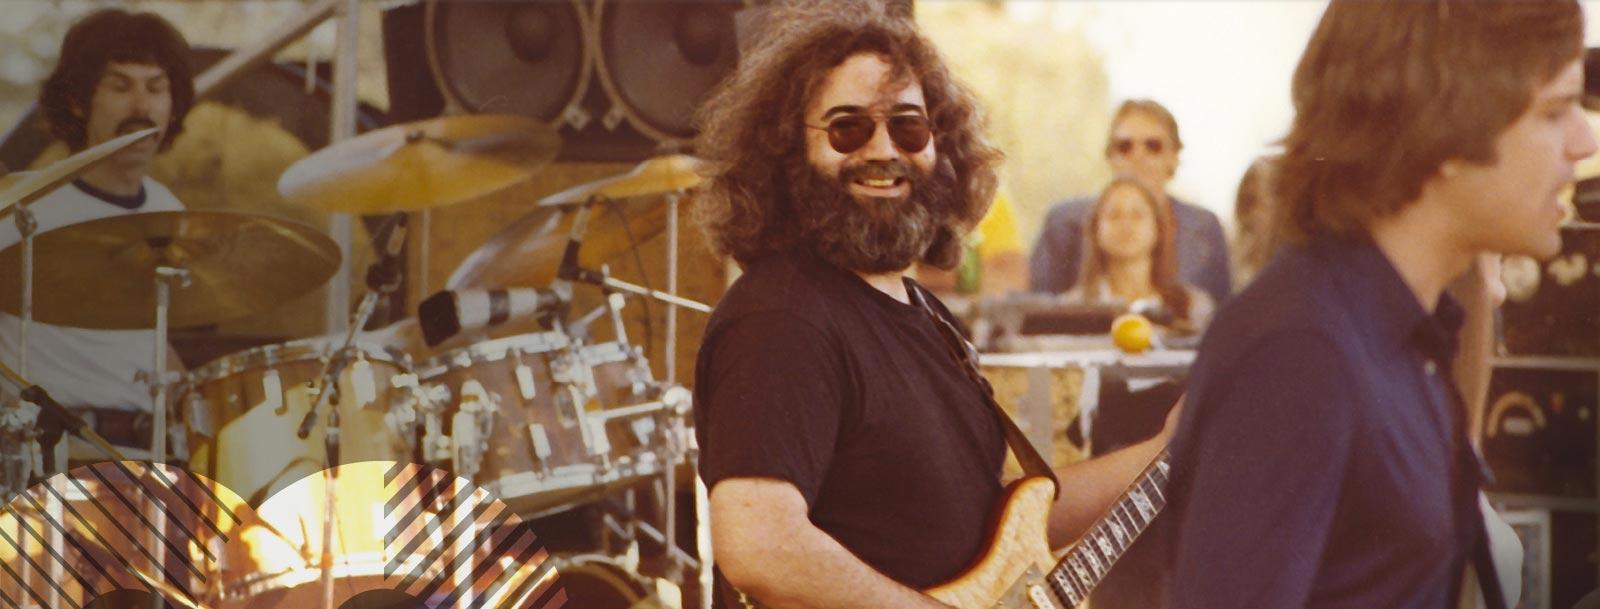 The man- Jerry Garcia (Photo Credit:  jerrygarcia.com )